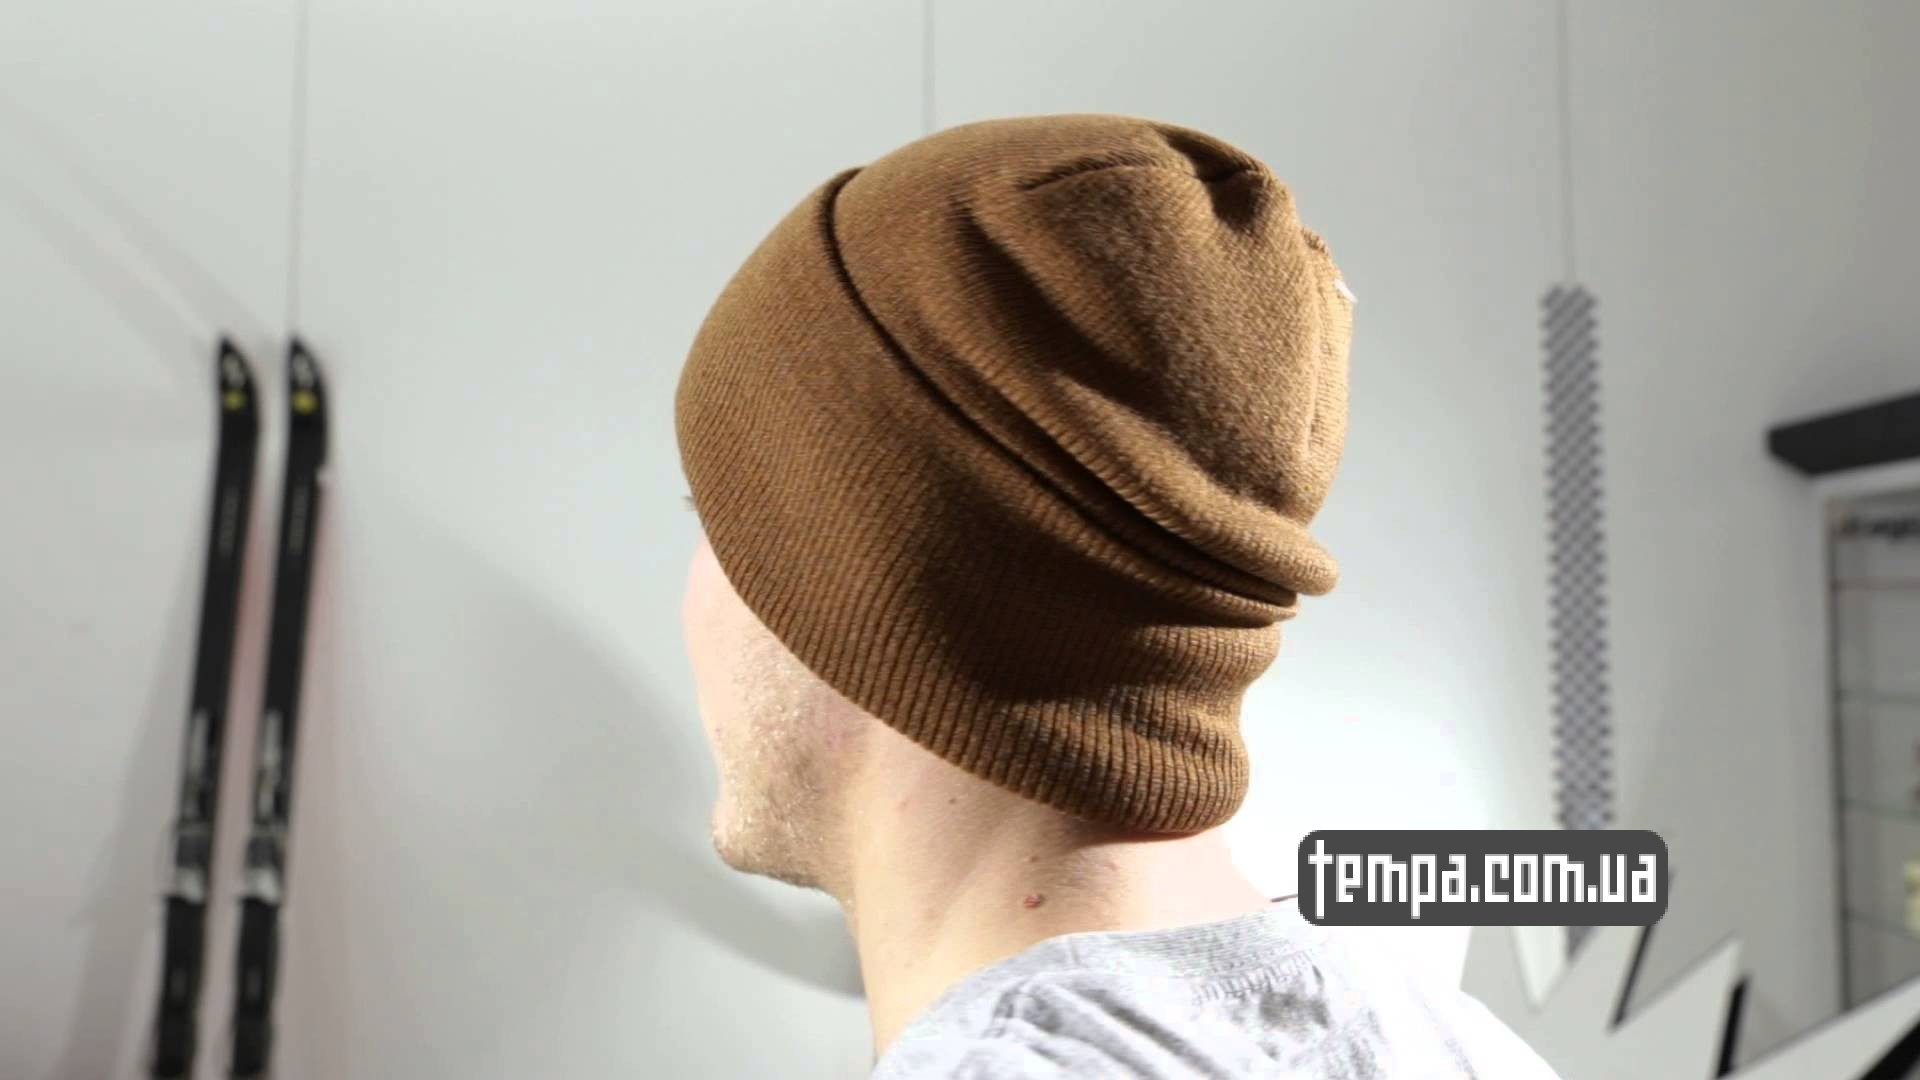 cahrhartt brown шапка купить магазин украна